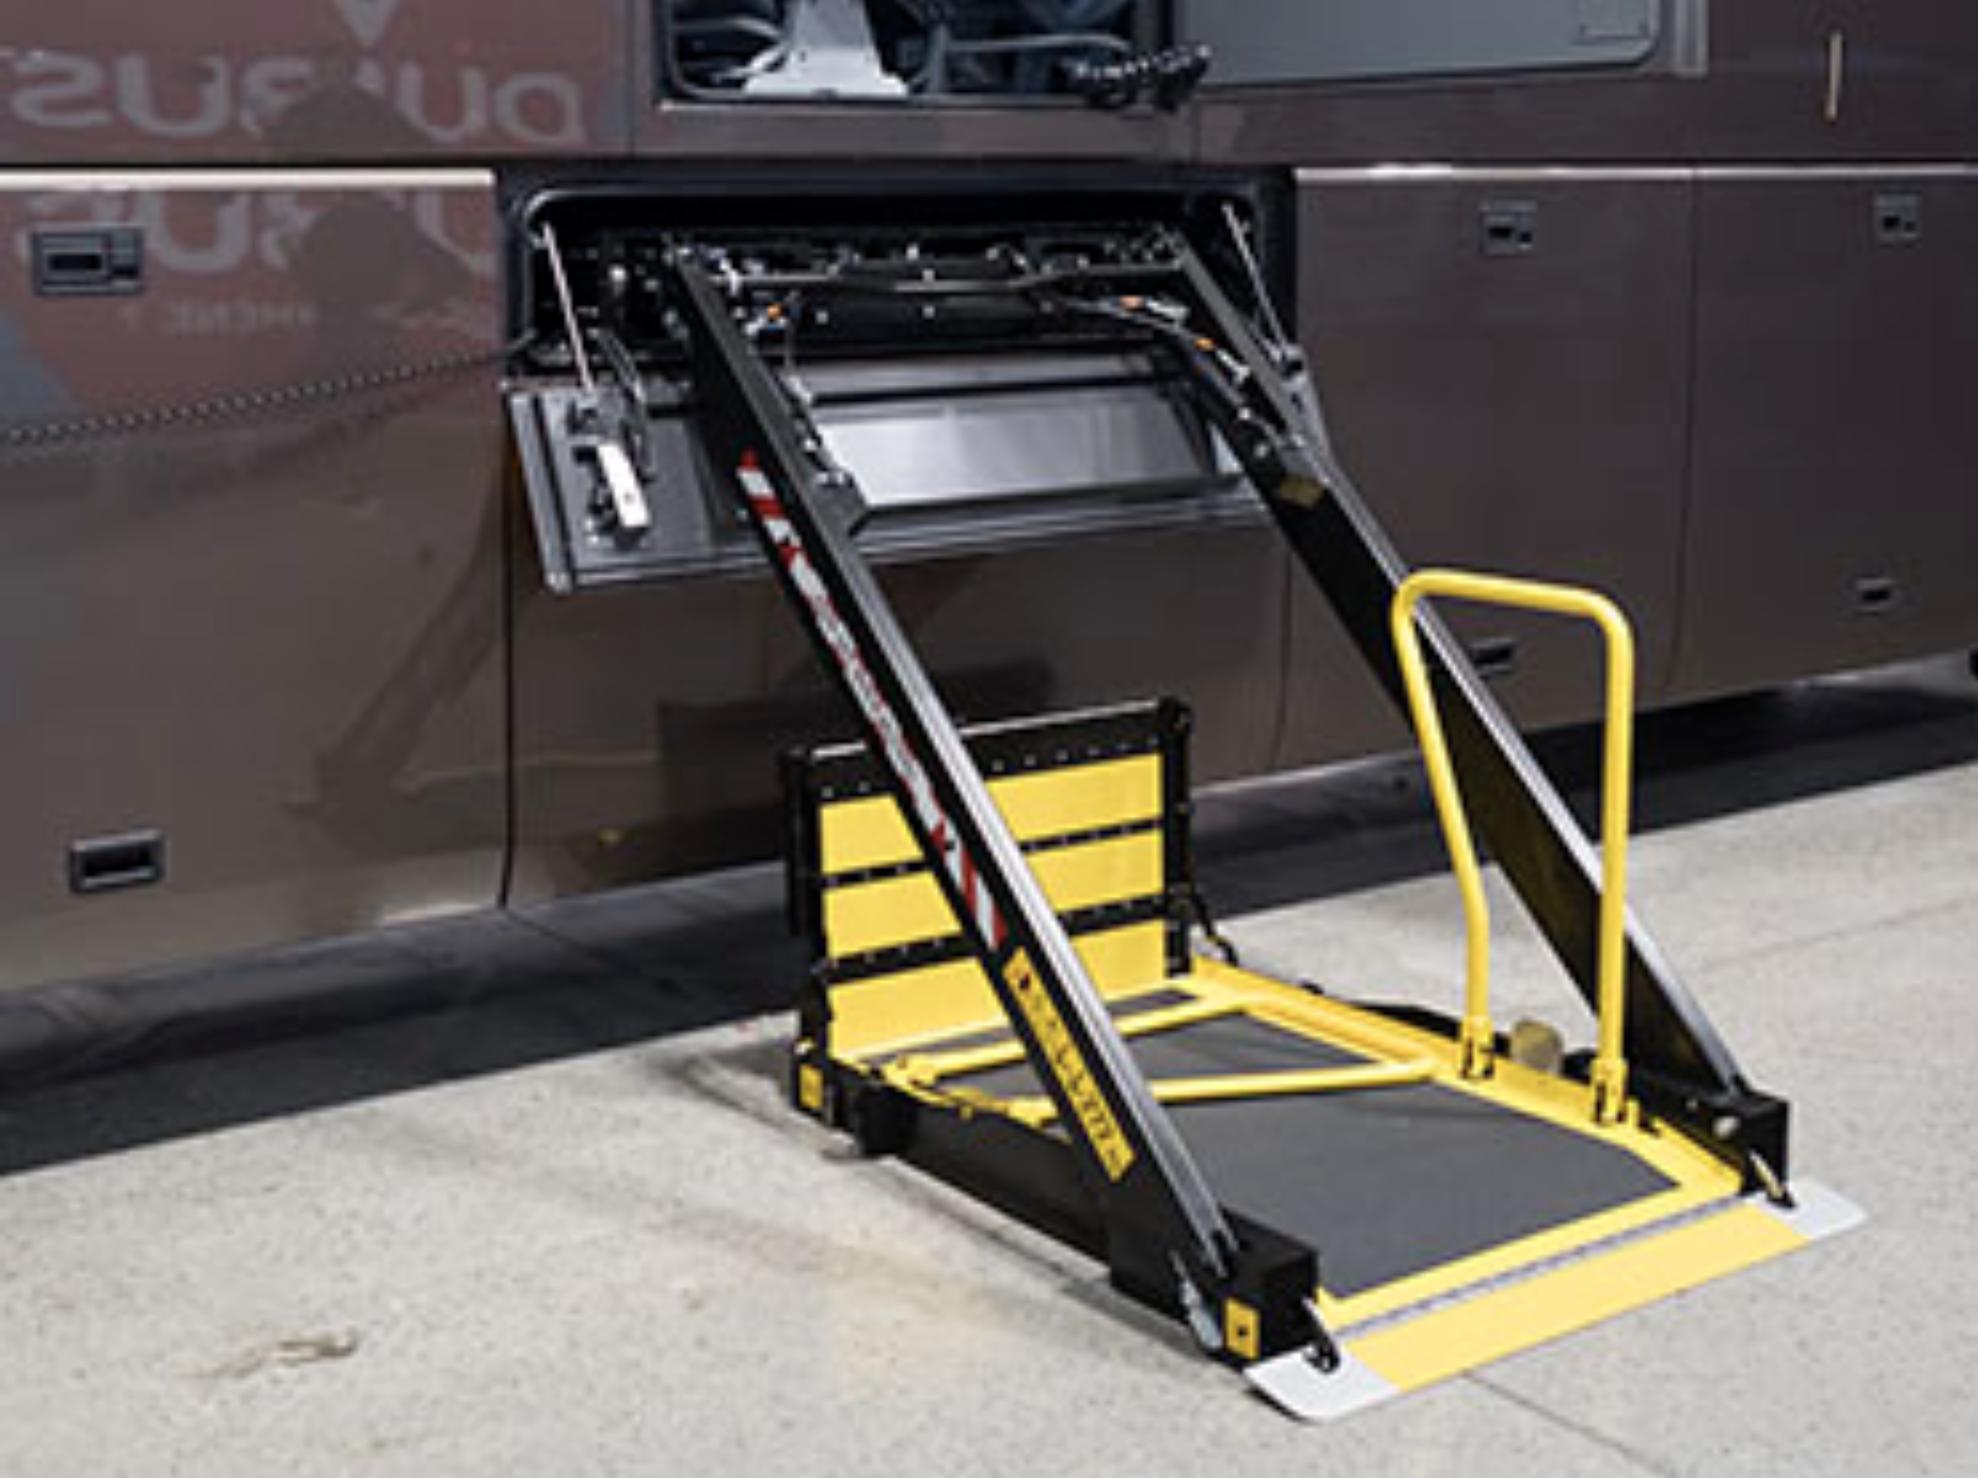 Masats KS8 Lift for Coaches